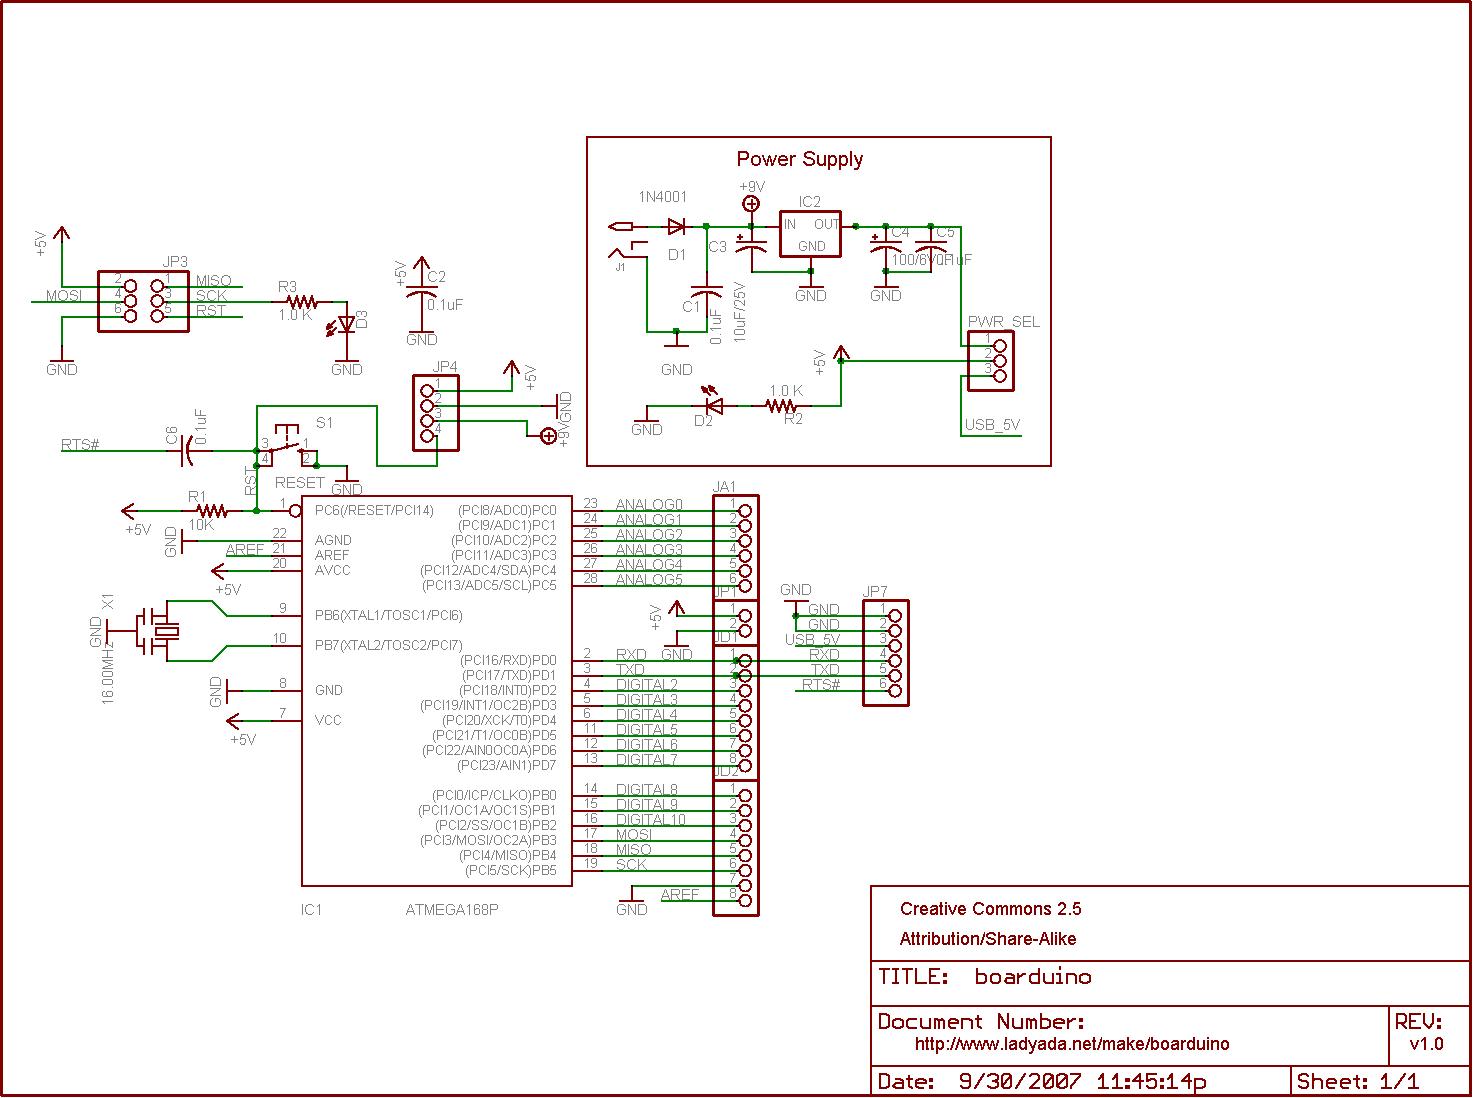 Barebones Arduino Schematic Engine Control Wiring Diagram Arduinocircuitsimulator Arduinosimulator Downloads Dc Usb Boarduino Kits Adafruit Learning System Rh Learn Com Diy Uno